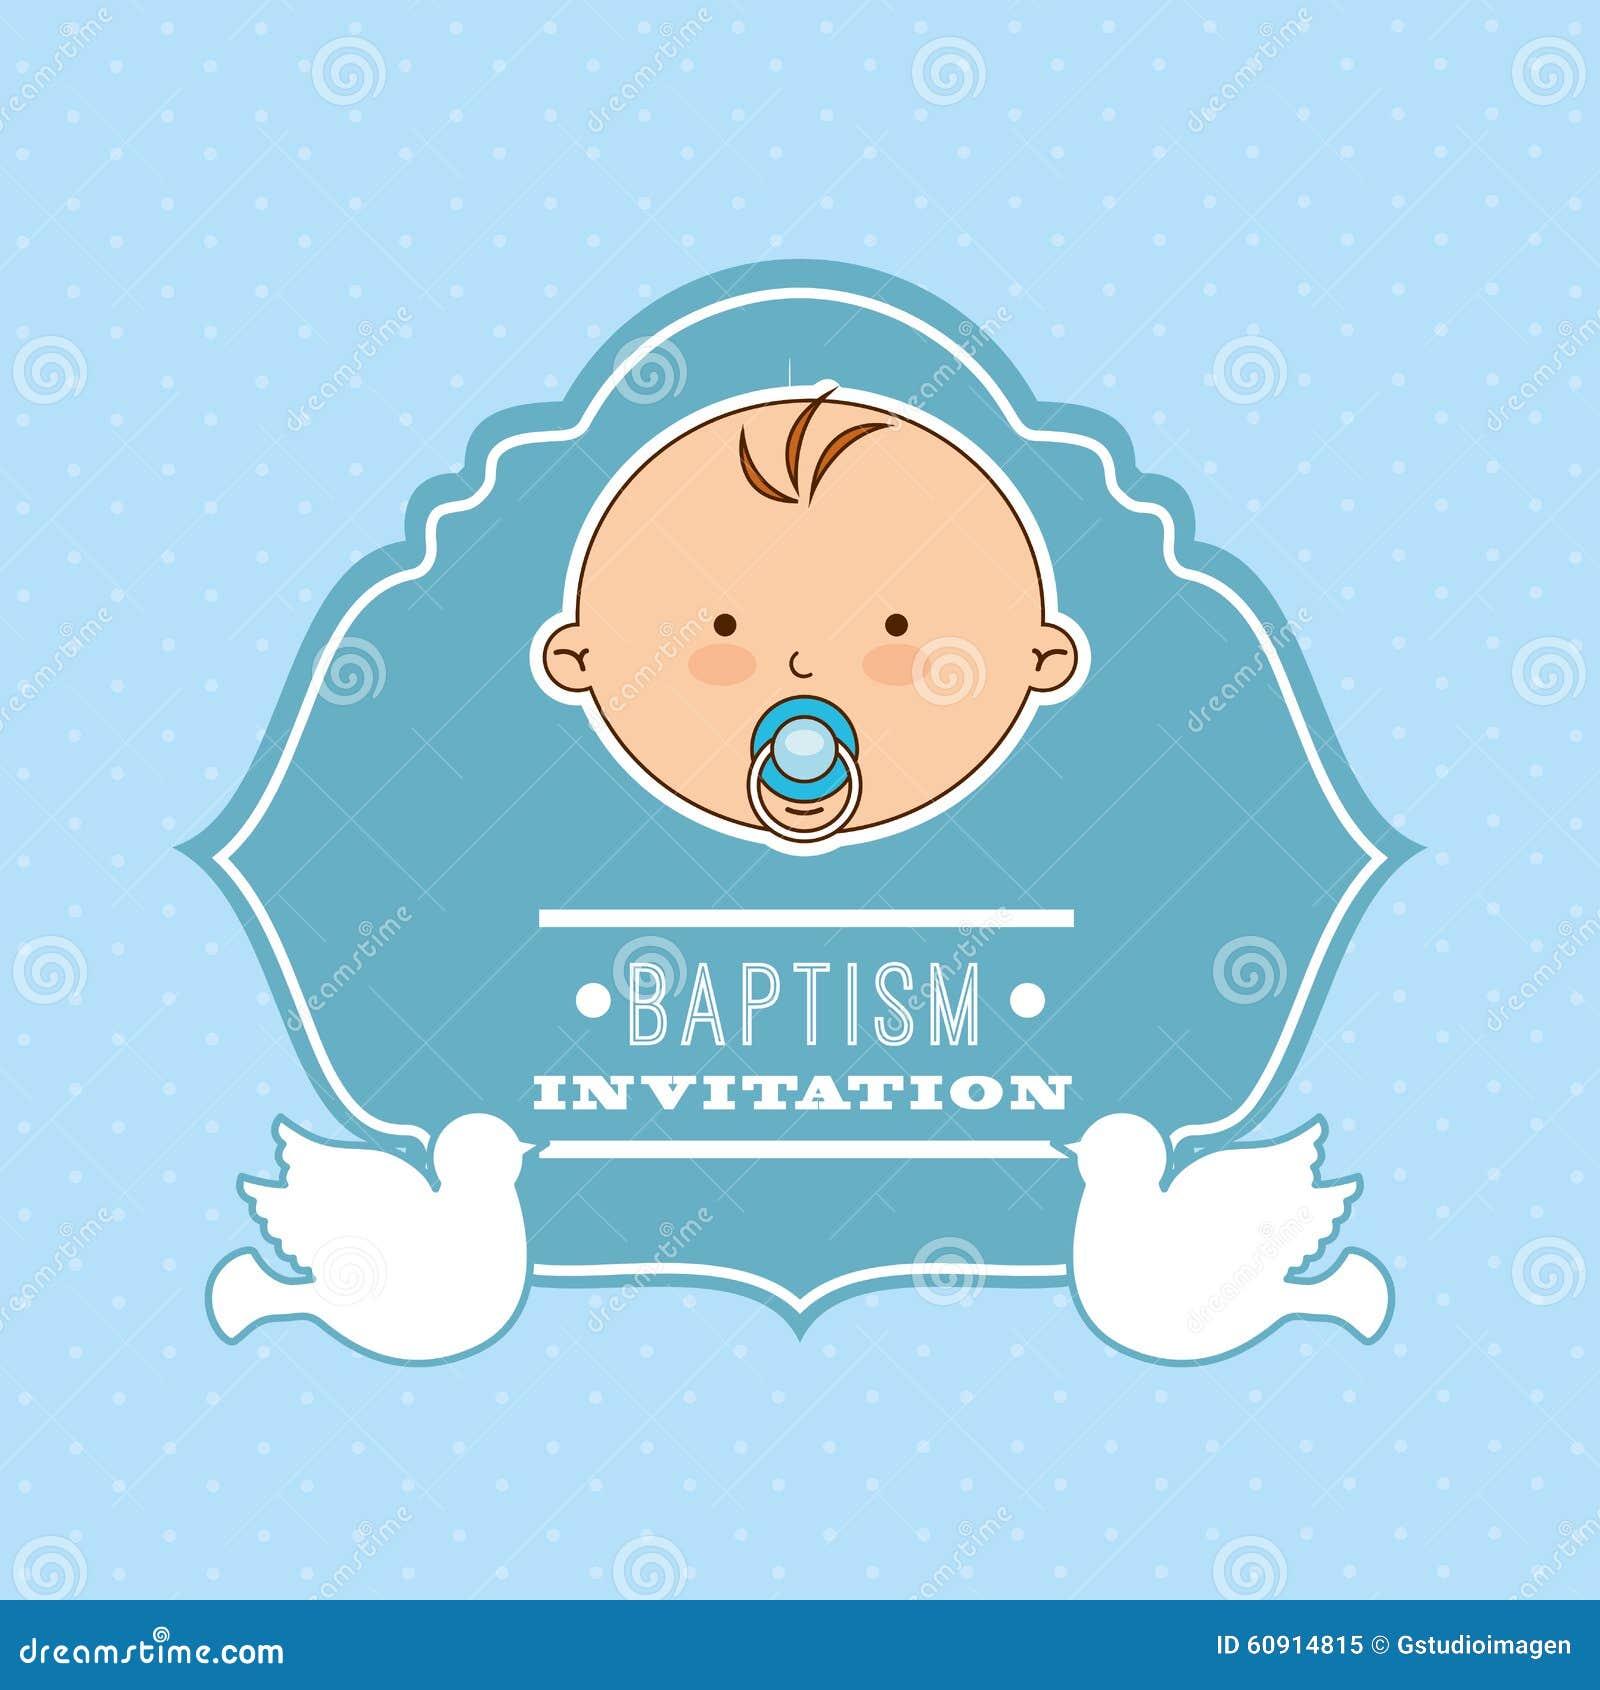 Baptism invitation design stock vector illustration of religious download baptism invitation design stock vector illustration of religious 60914815 stopboris Images